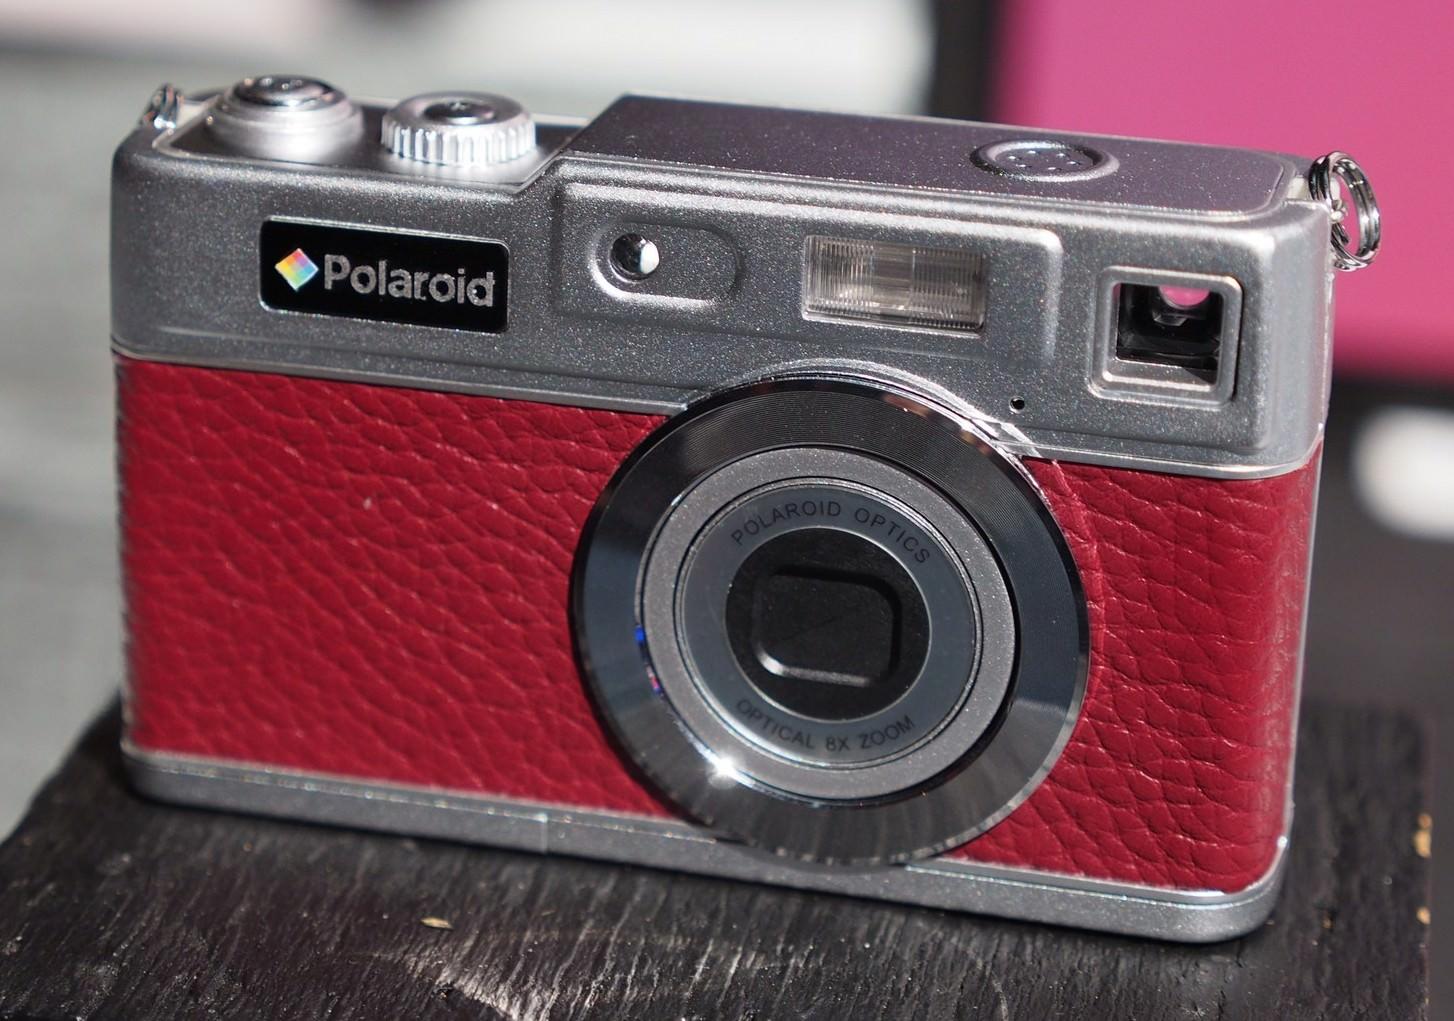 onn 18mp digital camera with 2.4 screen manual